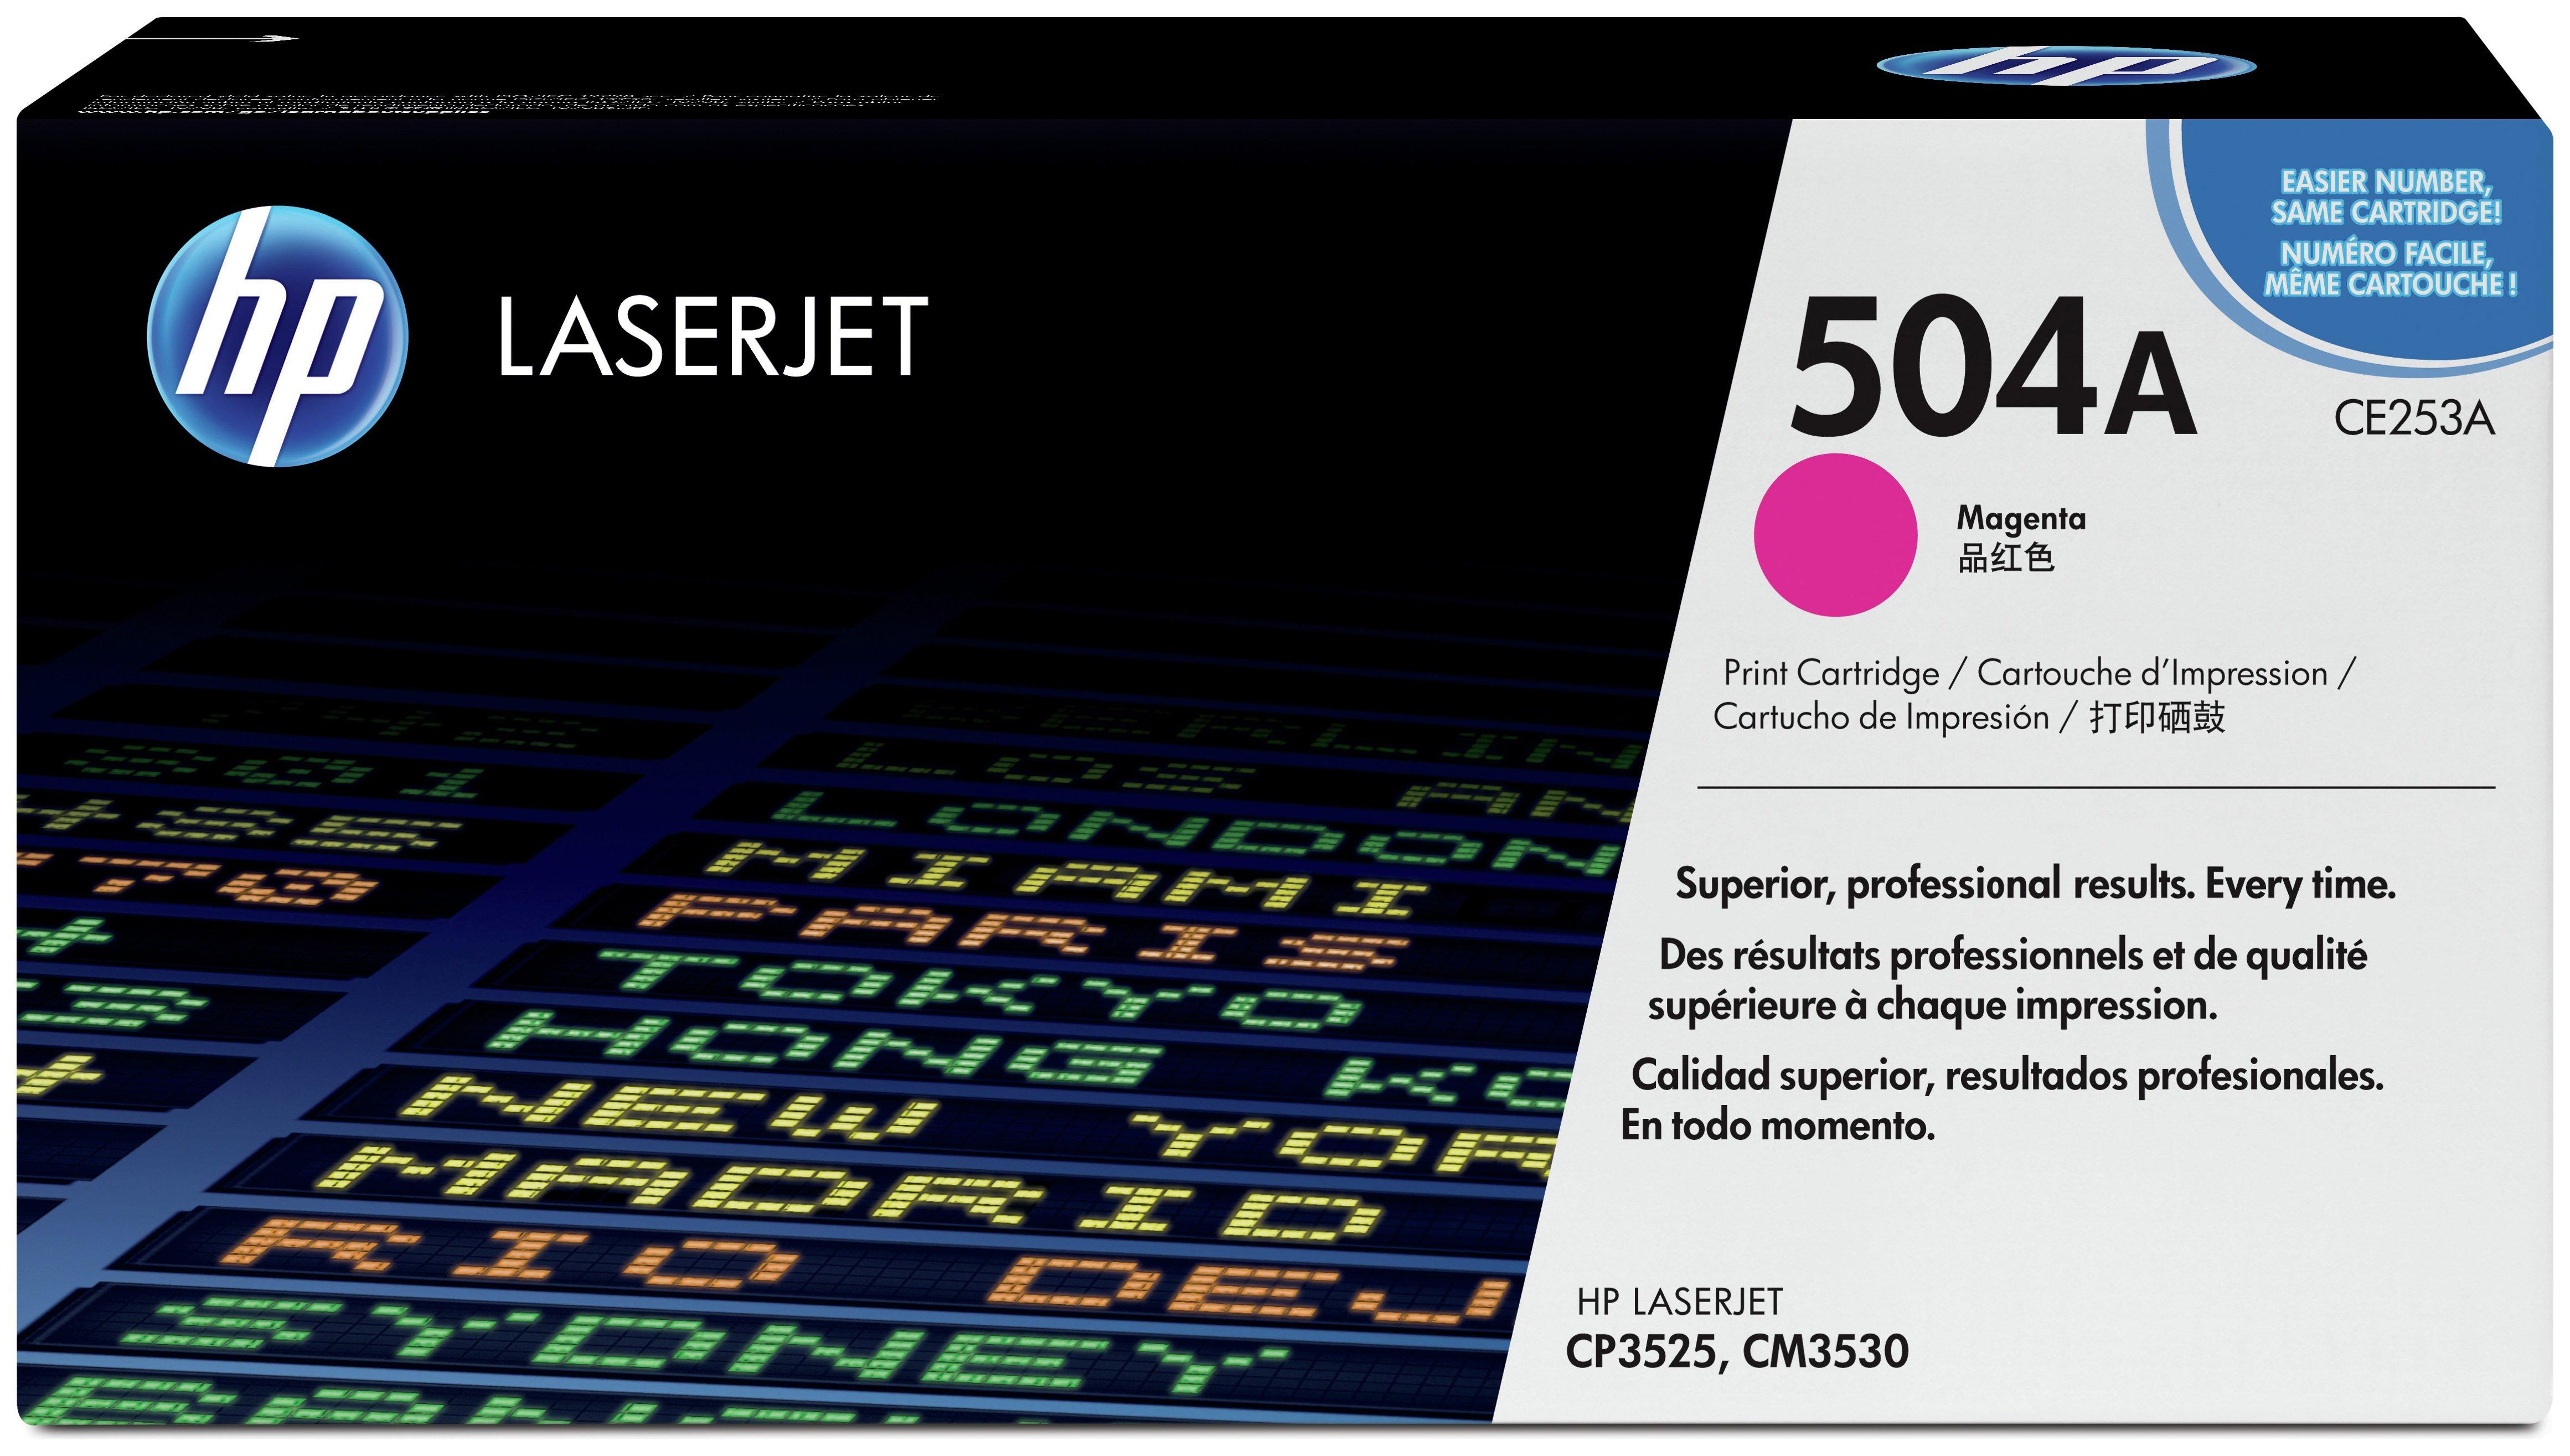 HP - 504A Magenta LaserJet - Toner Cartridge (CE253A)